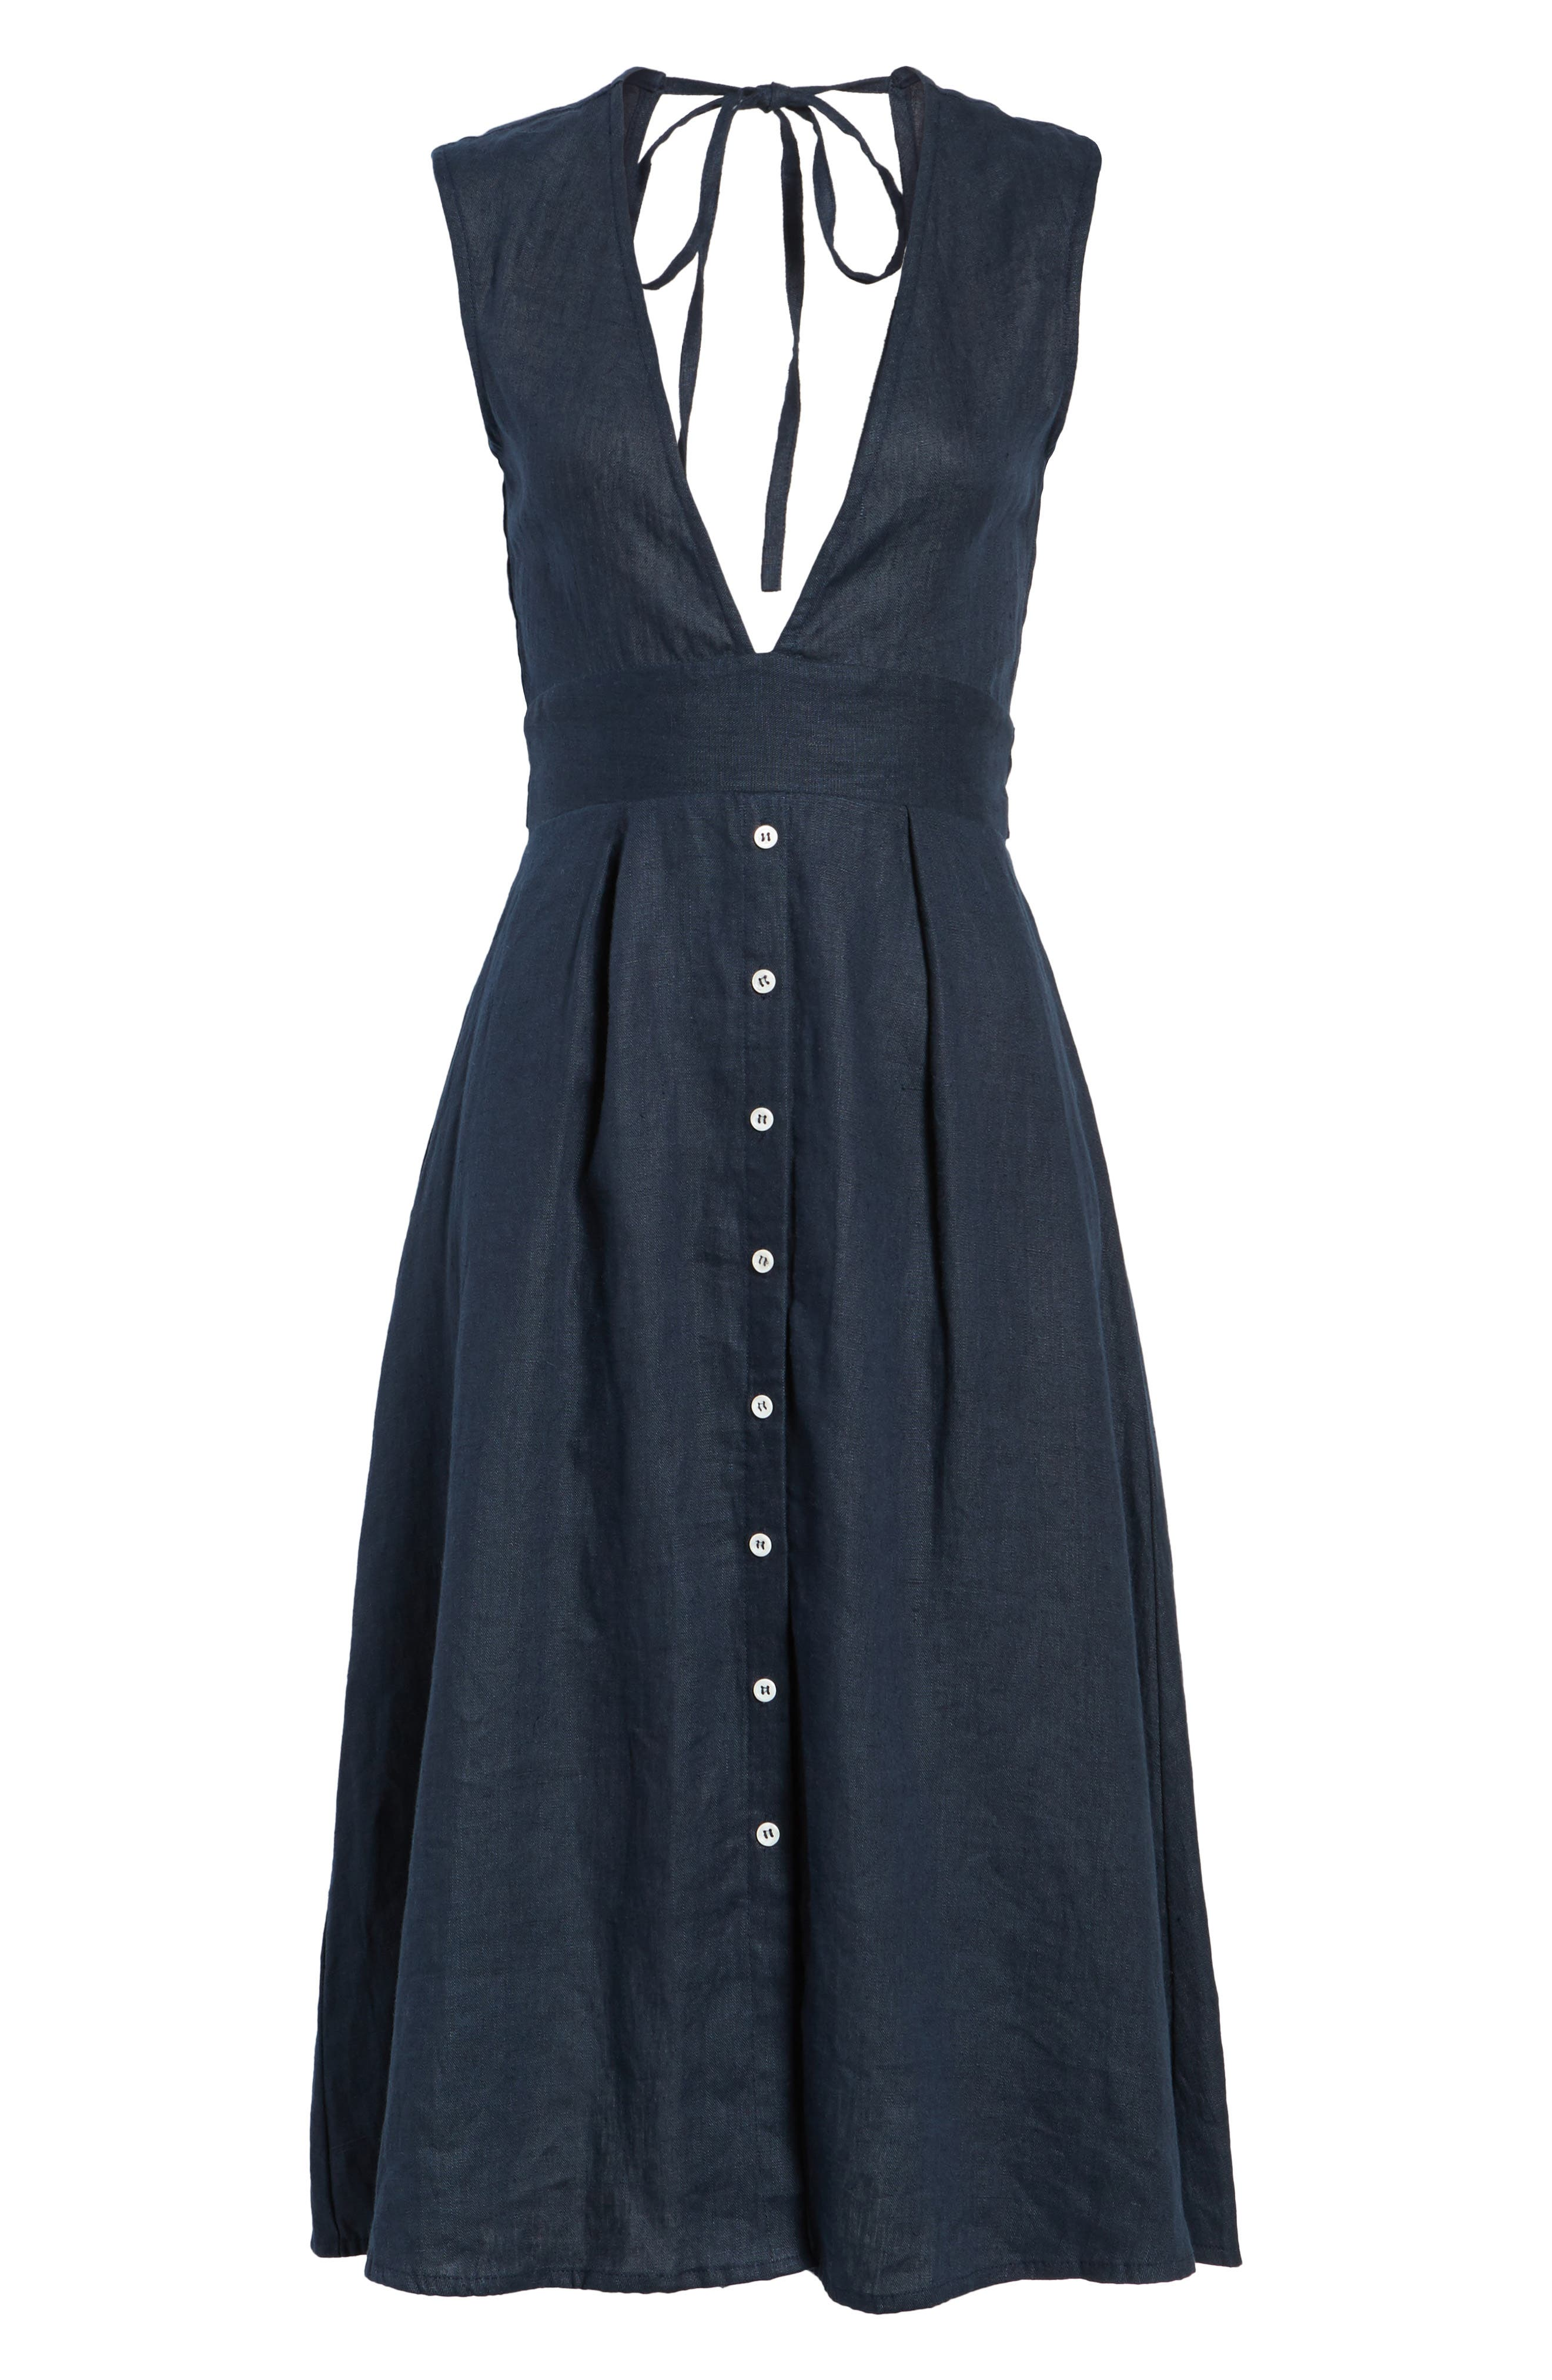 Le Roch Midi Dress,                             Alternate thumbnail 7, color,                             Plain Navy